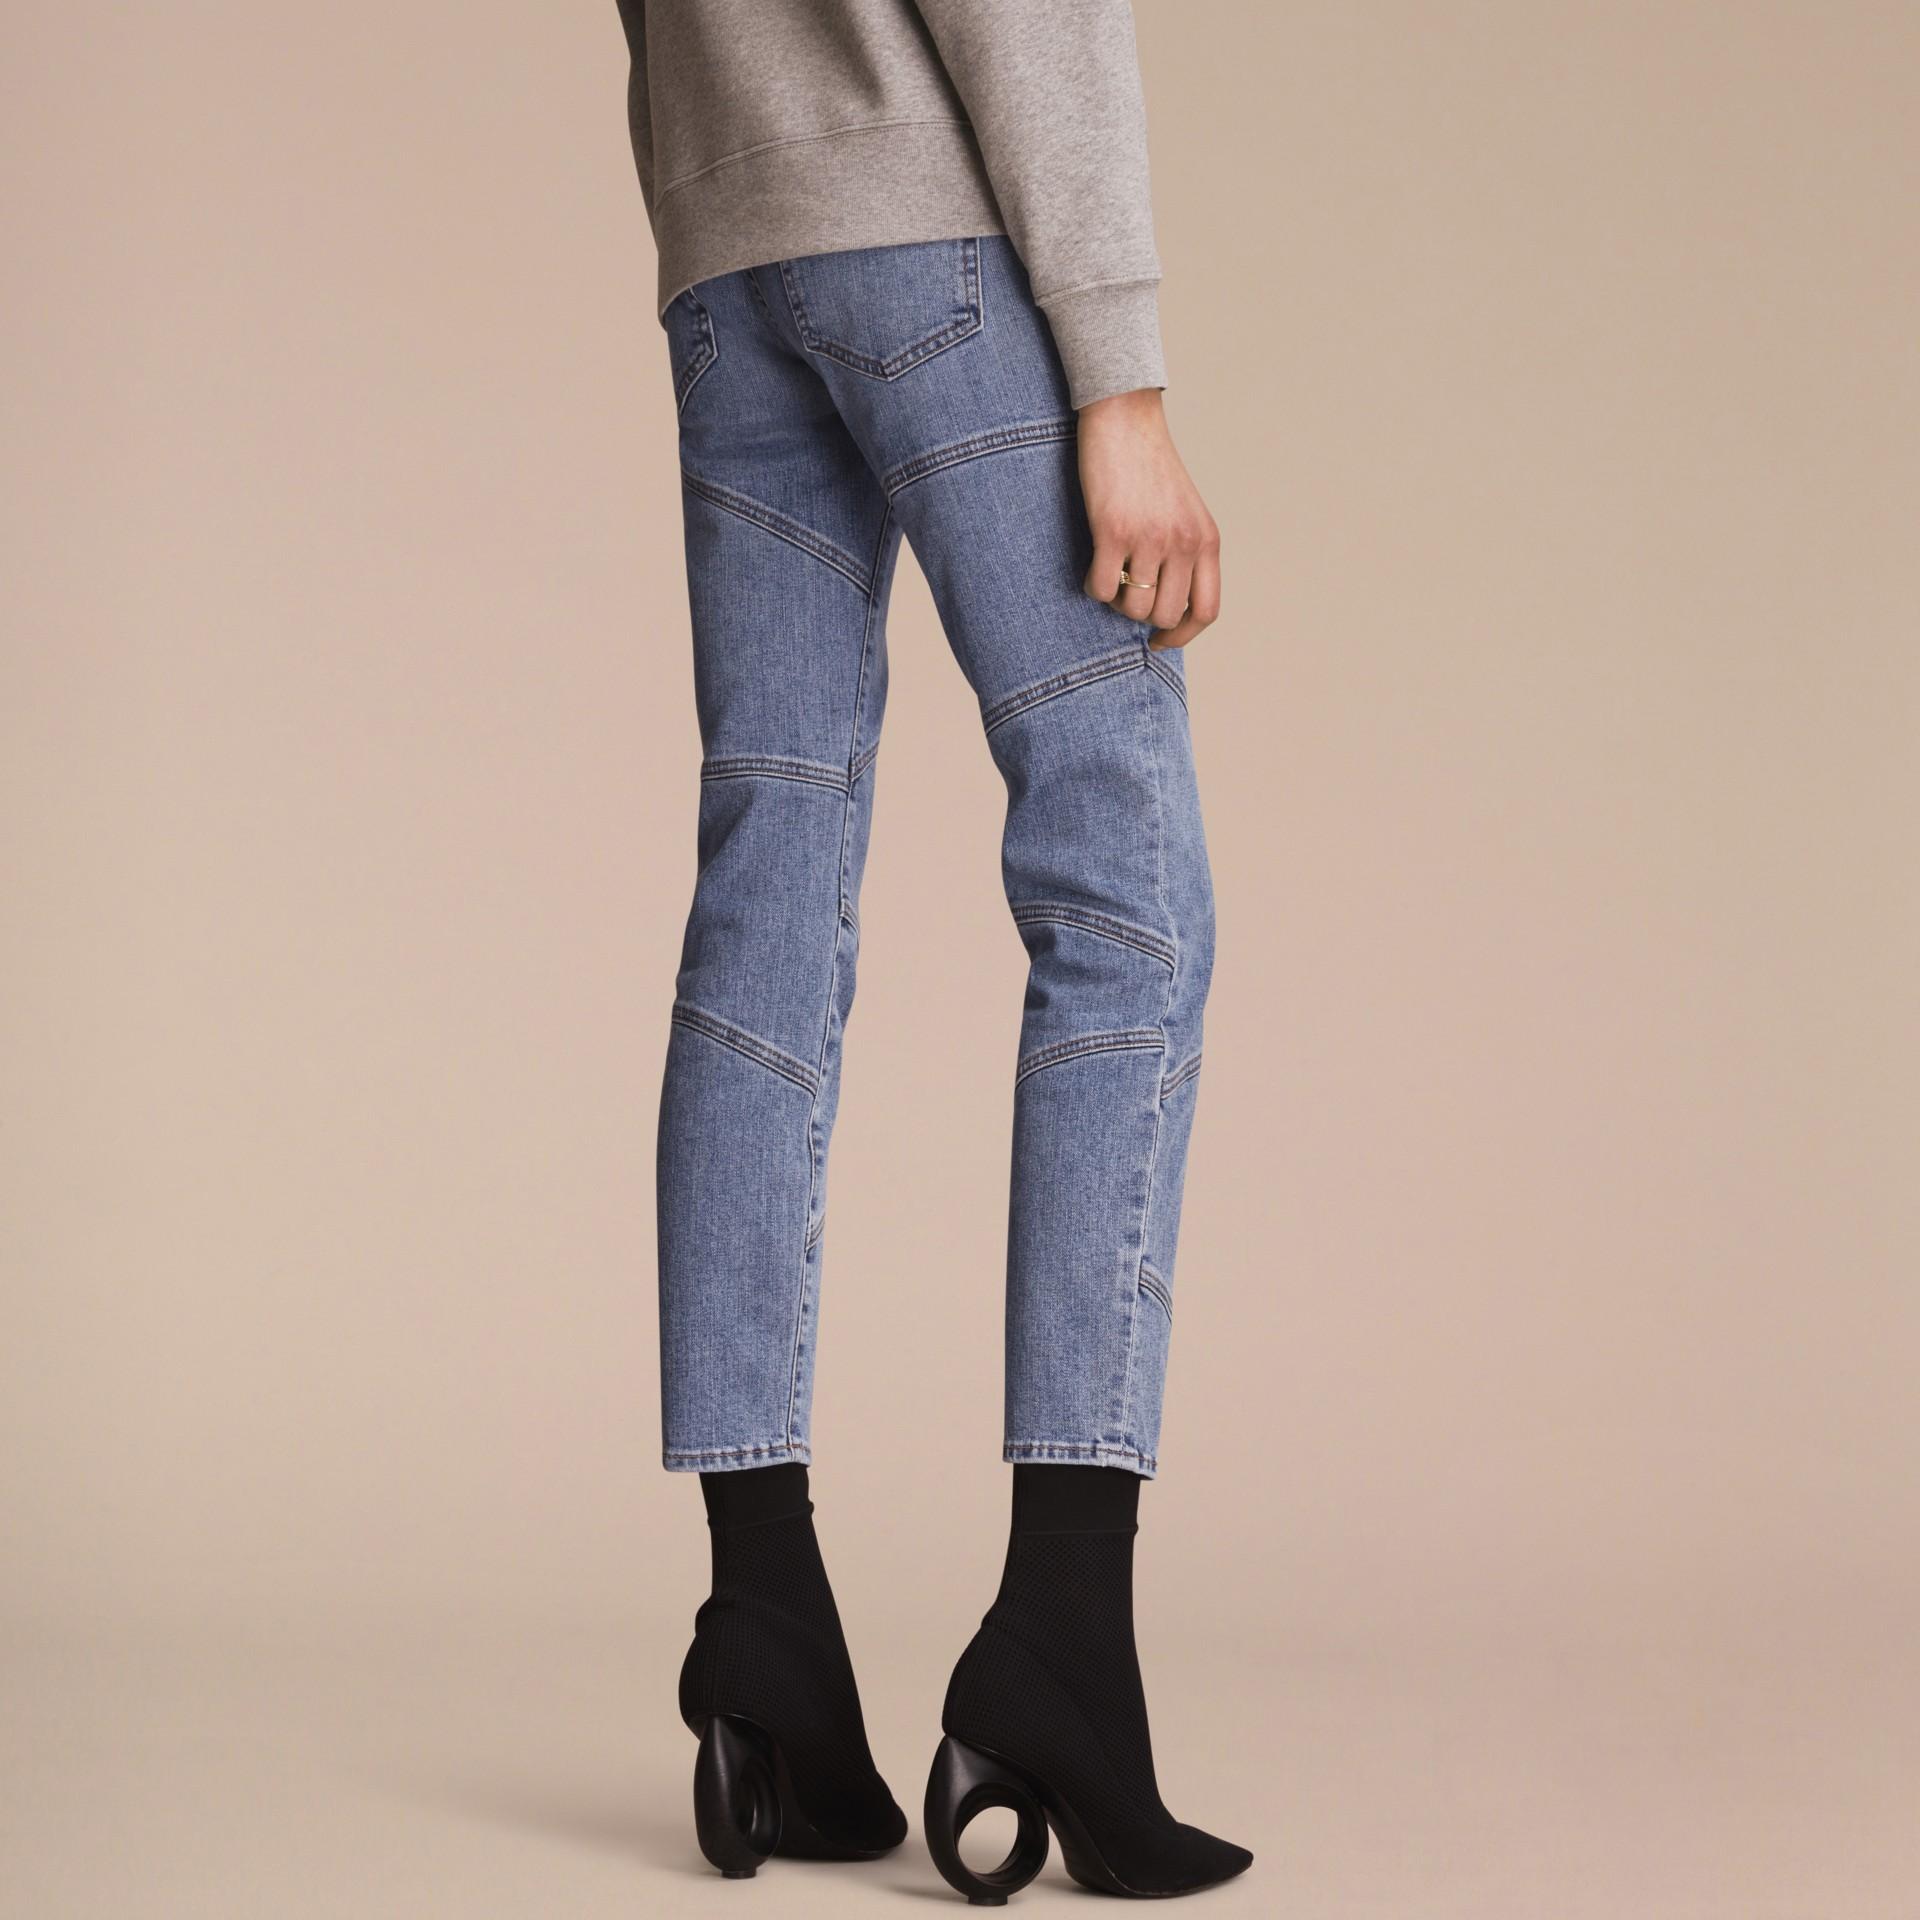 Slim Fit Seam Detail Japanese Denim Jeans - gallery image 3